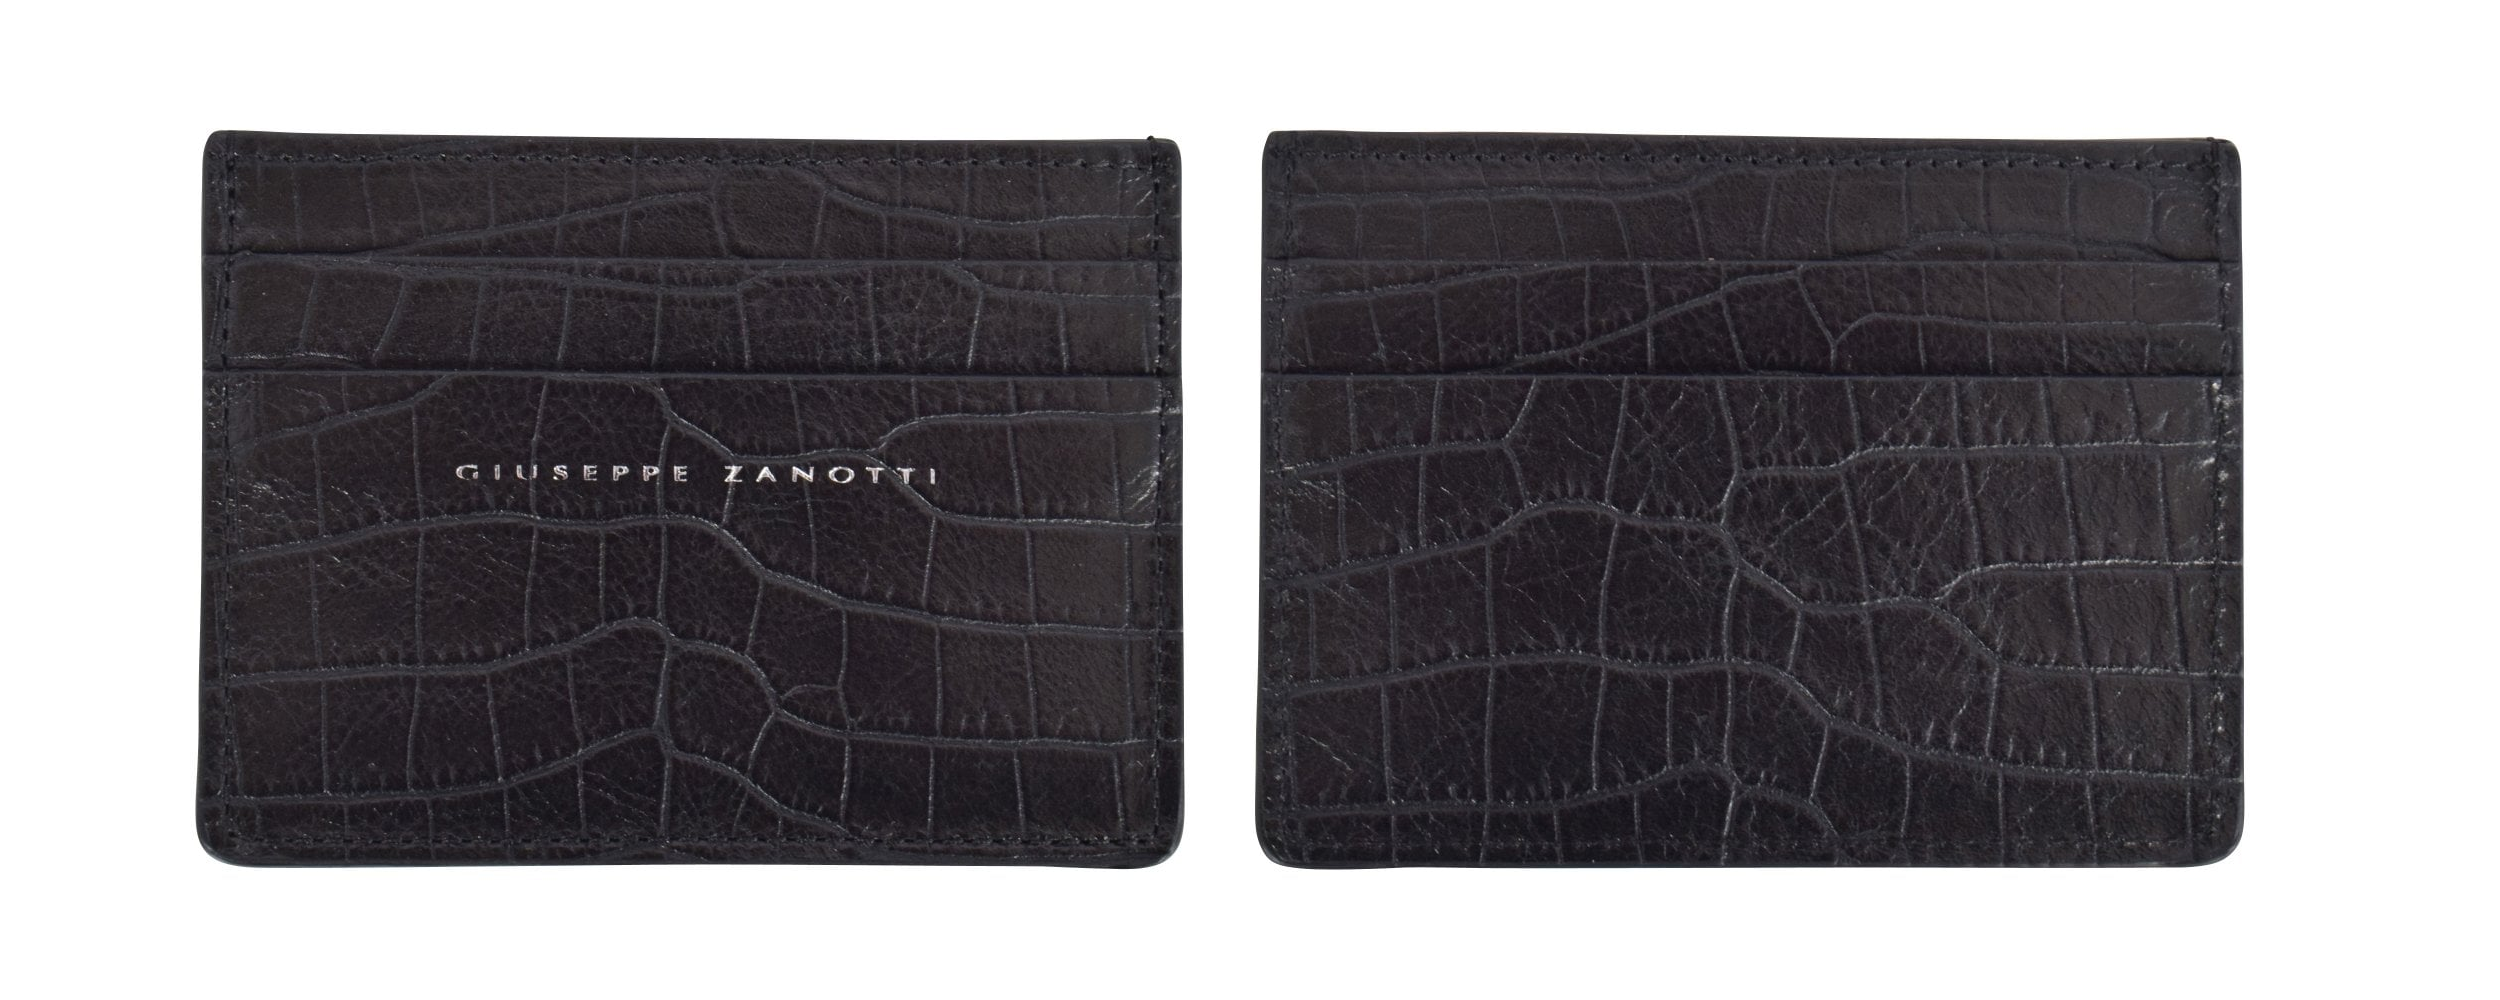 Giuseppe Zanotti Wallet